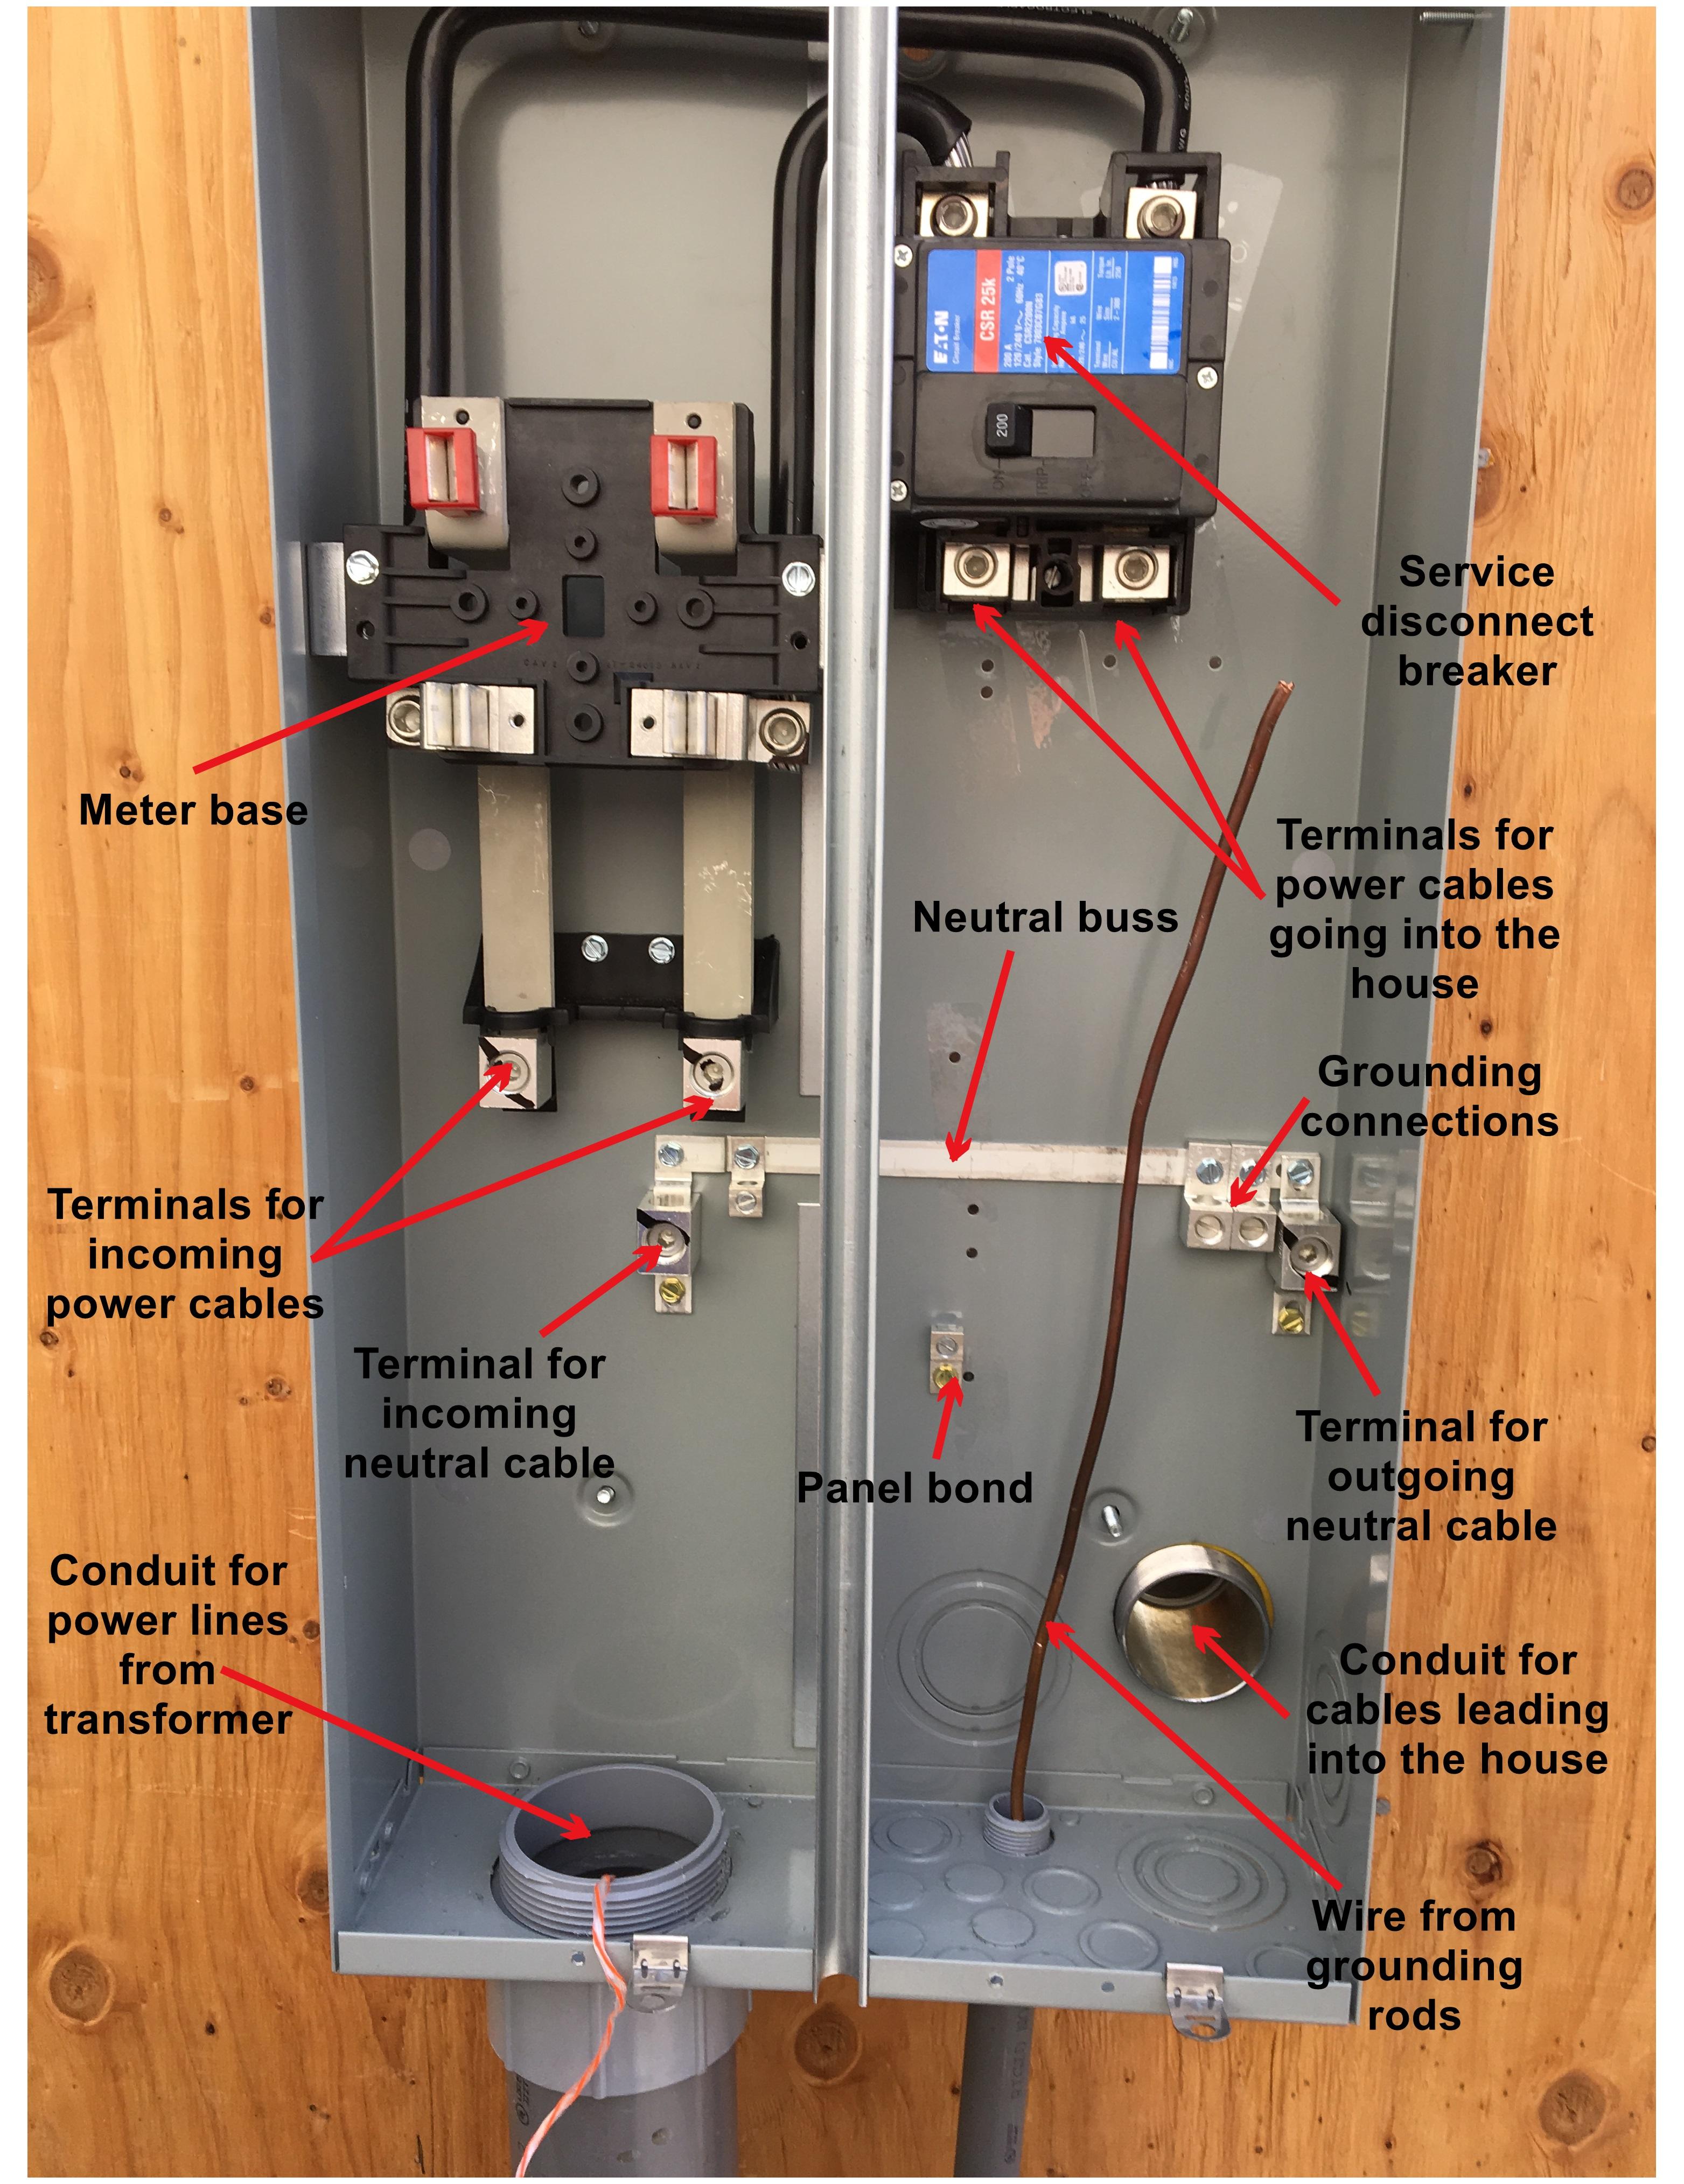 diy qualifications frank s home remodeling project rh diydivo com wiring meter box to breaker box wiring meter board